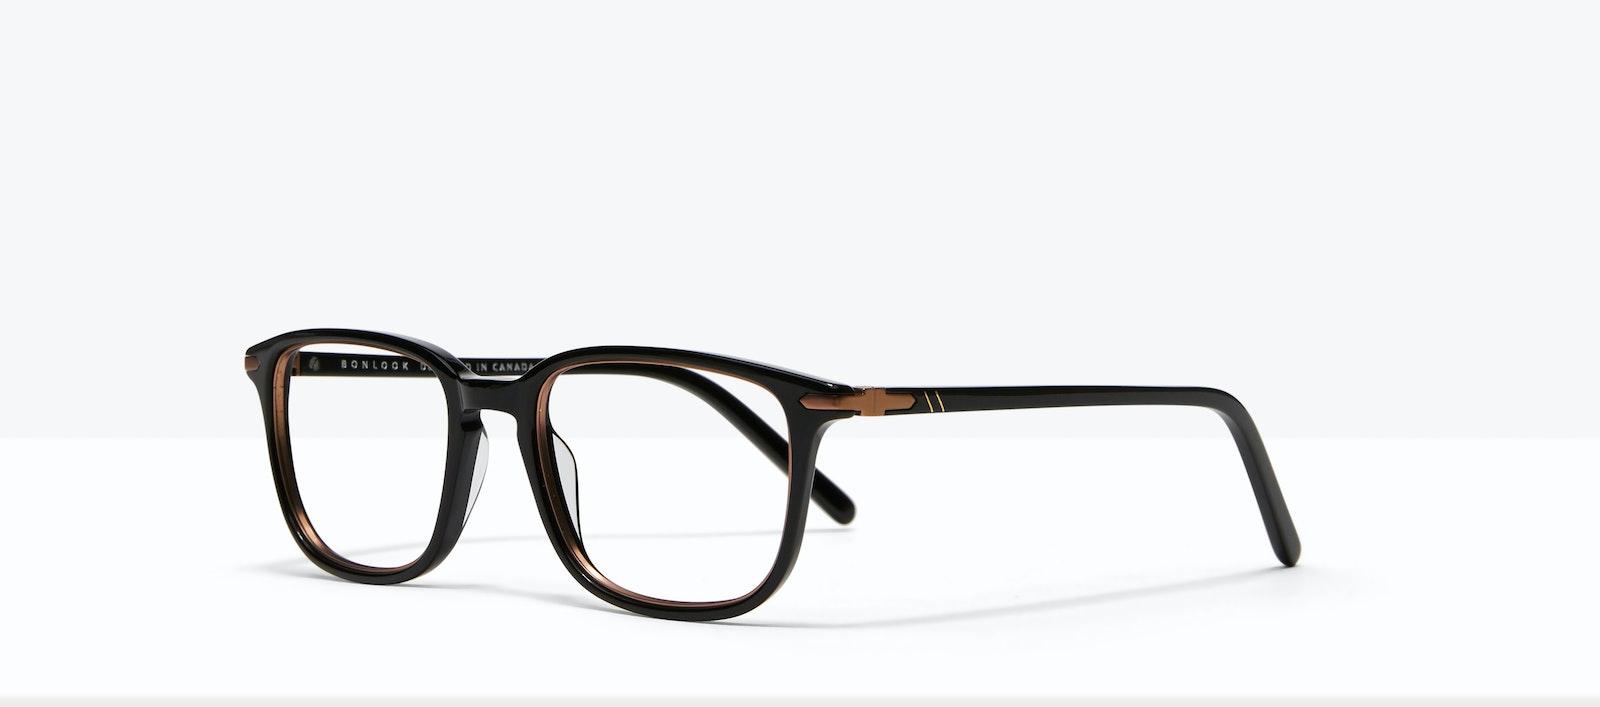 Affordable Fashion Glasses Square Eyeglasses Men Sharp Lux Black Copper Tilt